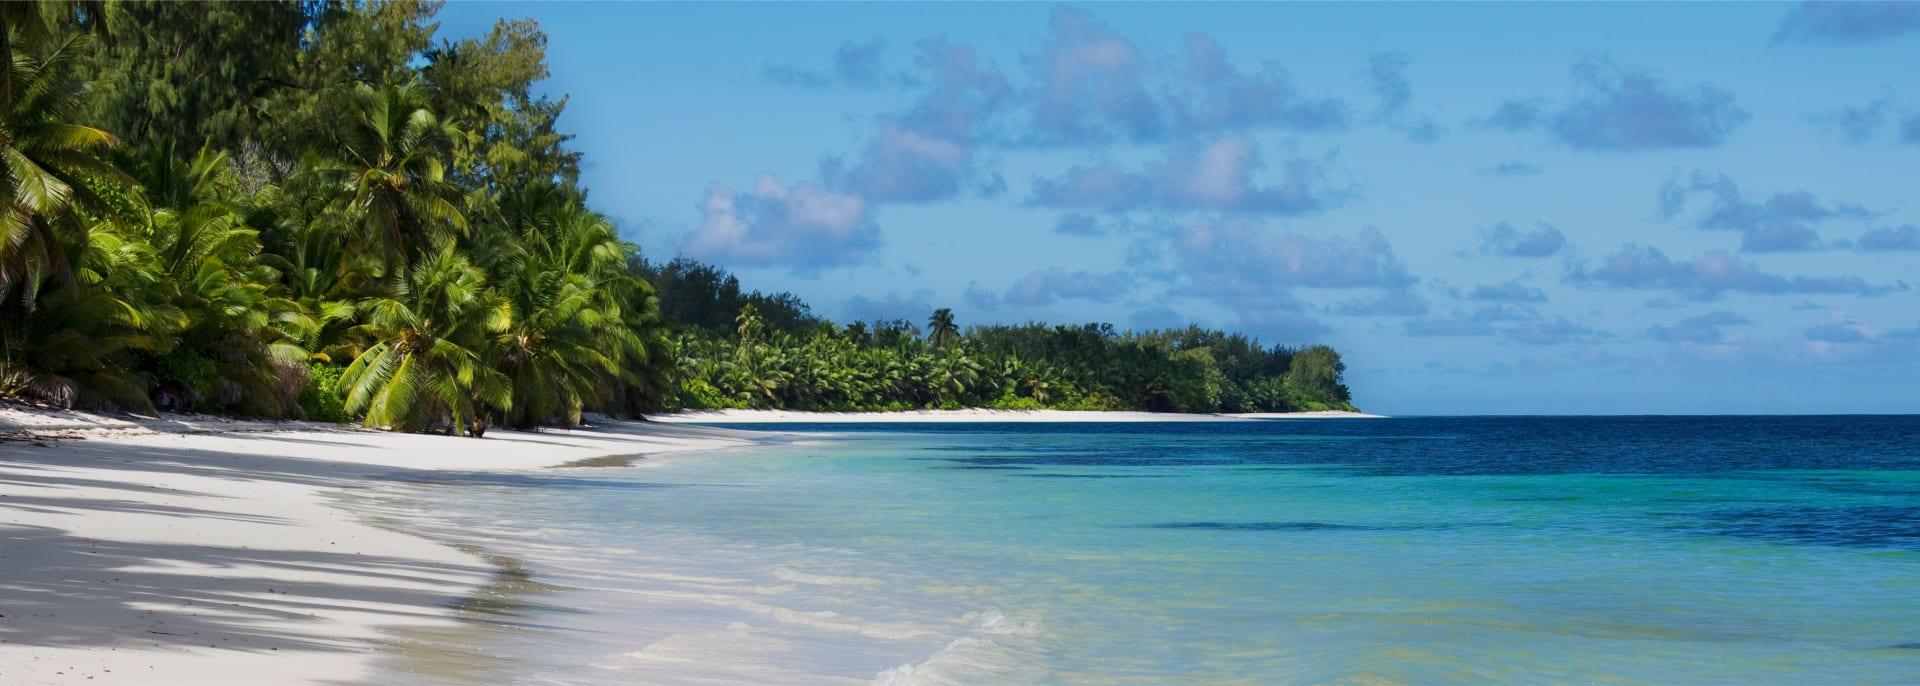 Beach of Desroches Island, Seychelles